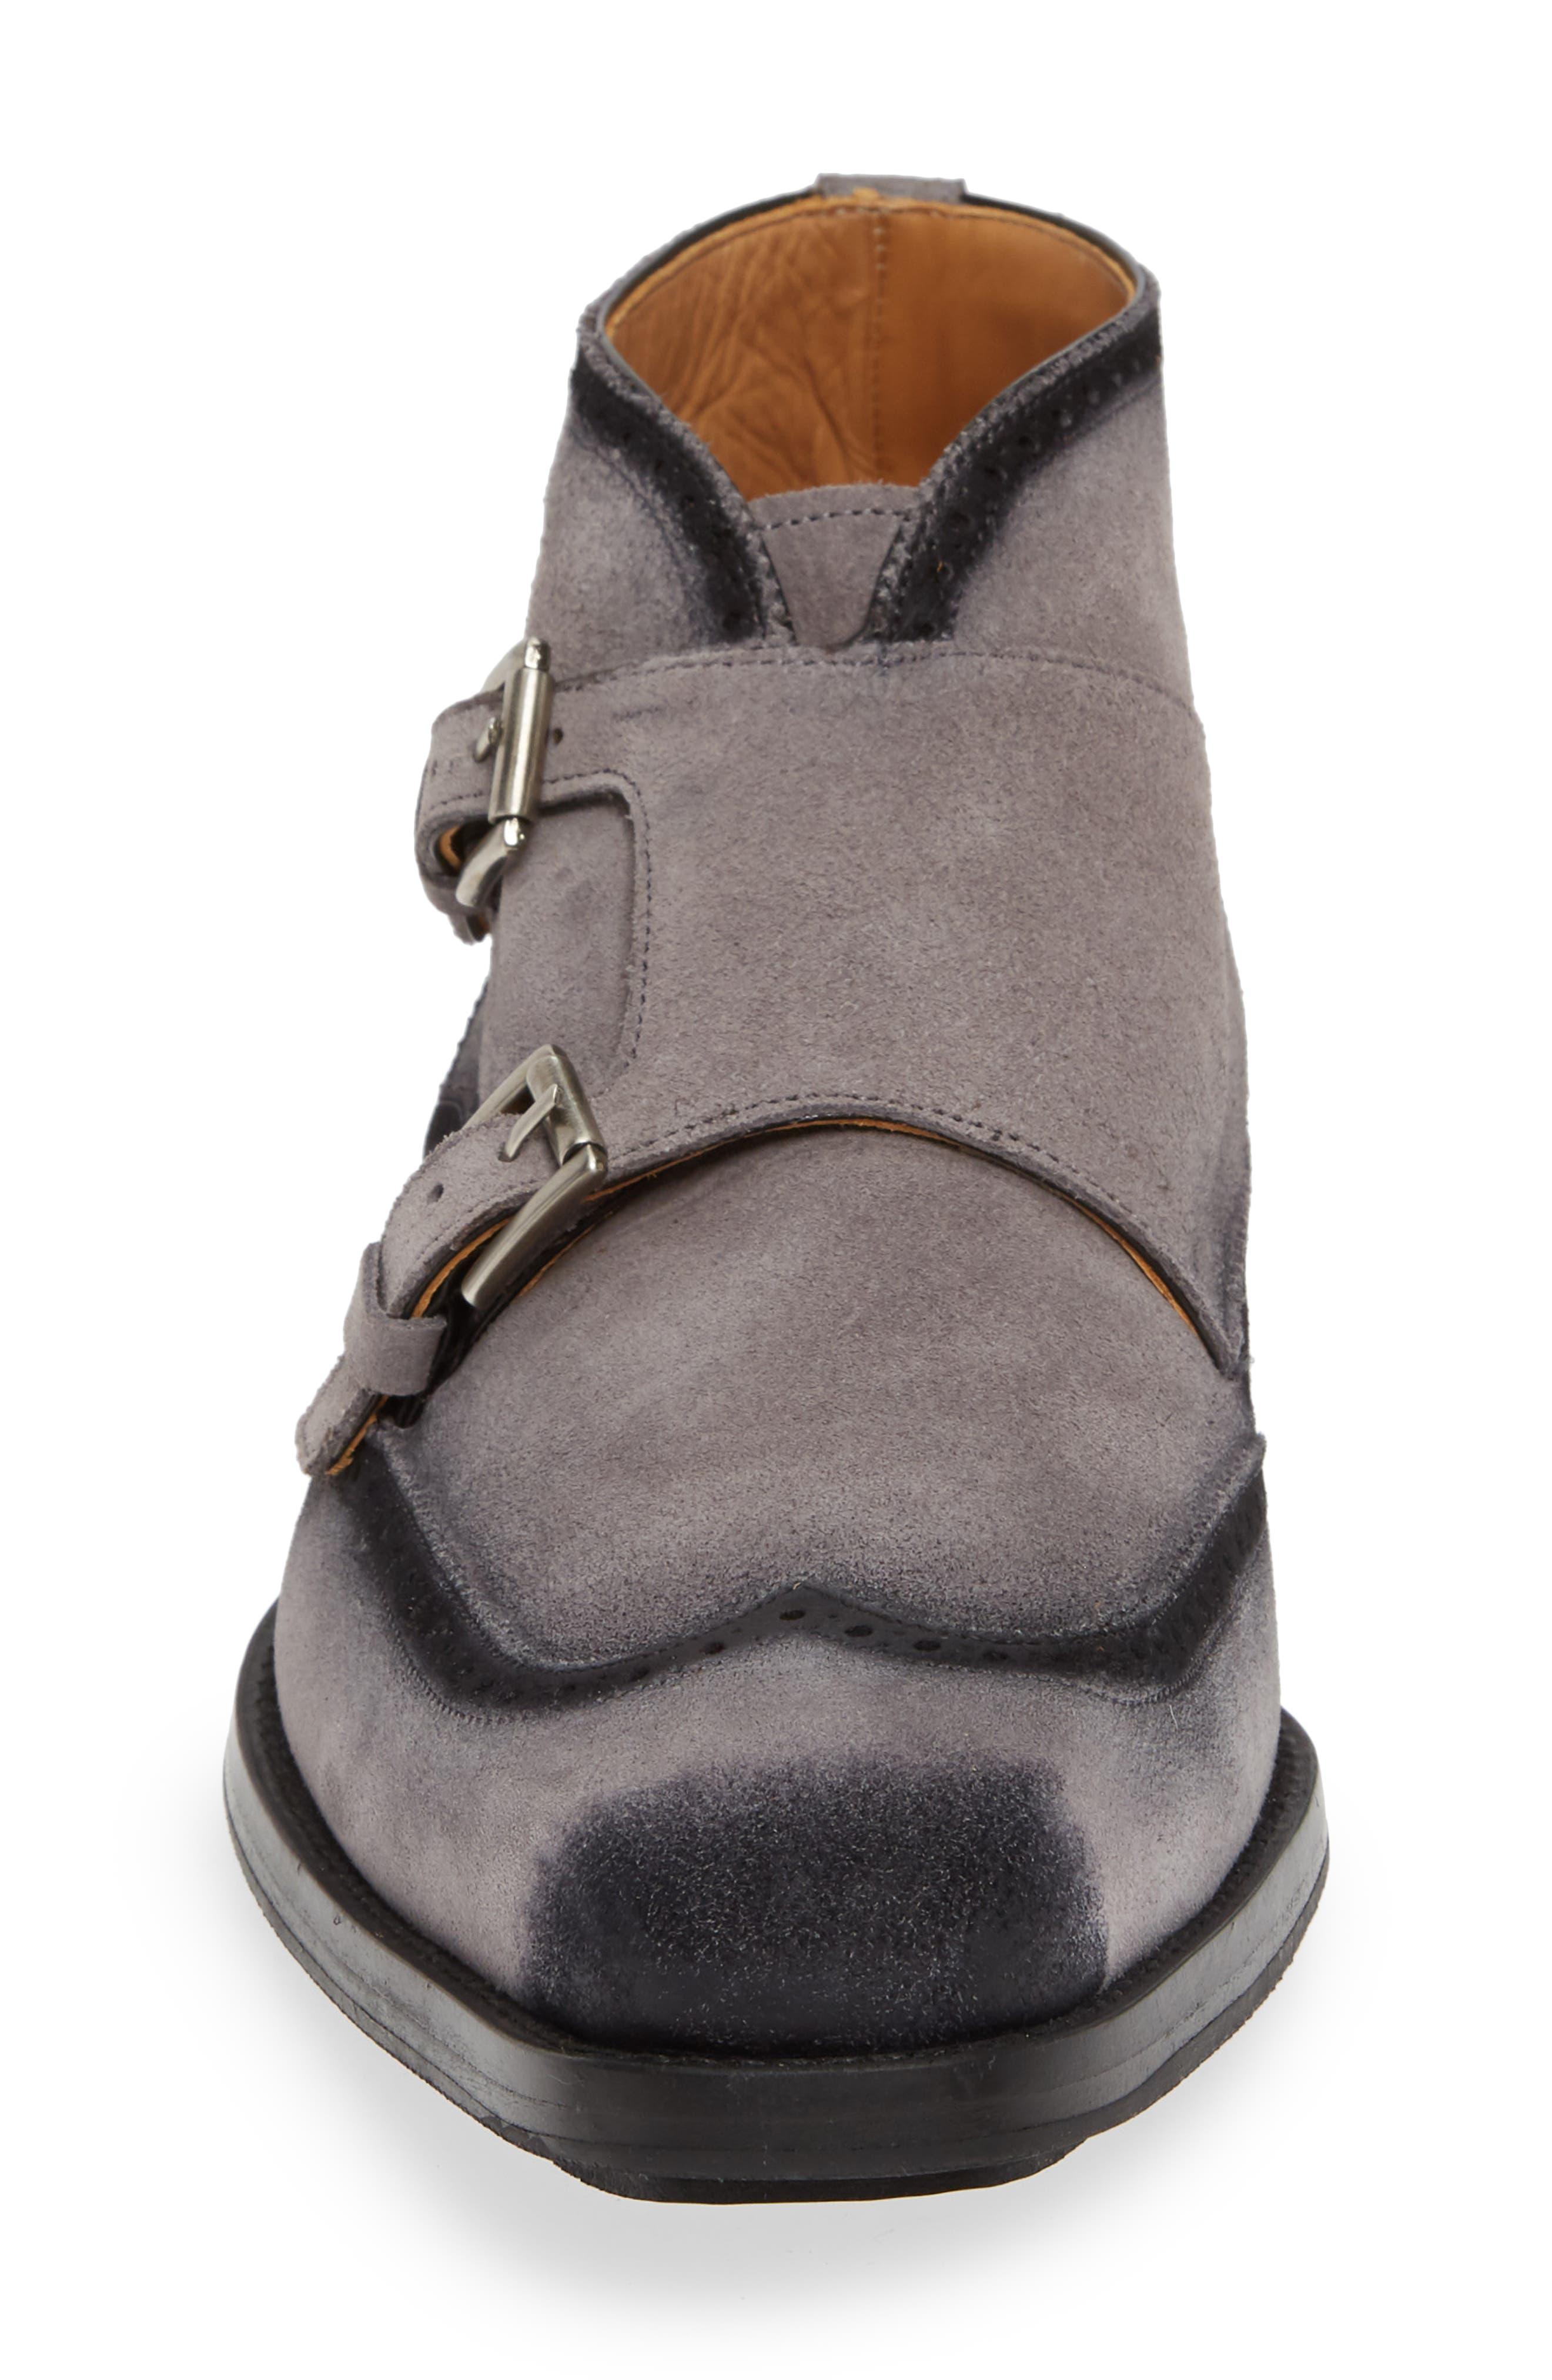 Munoz Double Monk Strap Boot,                             Alternate thumbnail 4, color,                             GREY SUEDE